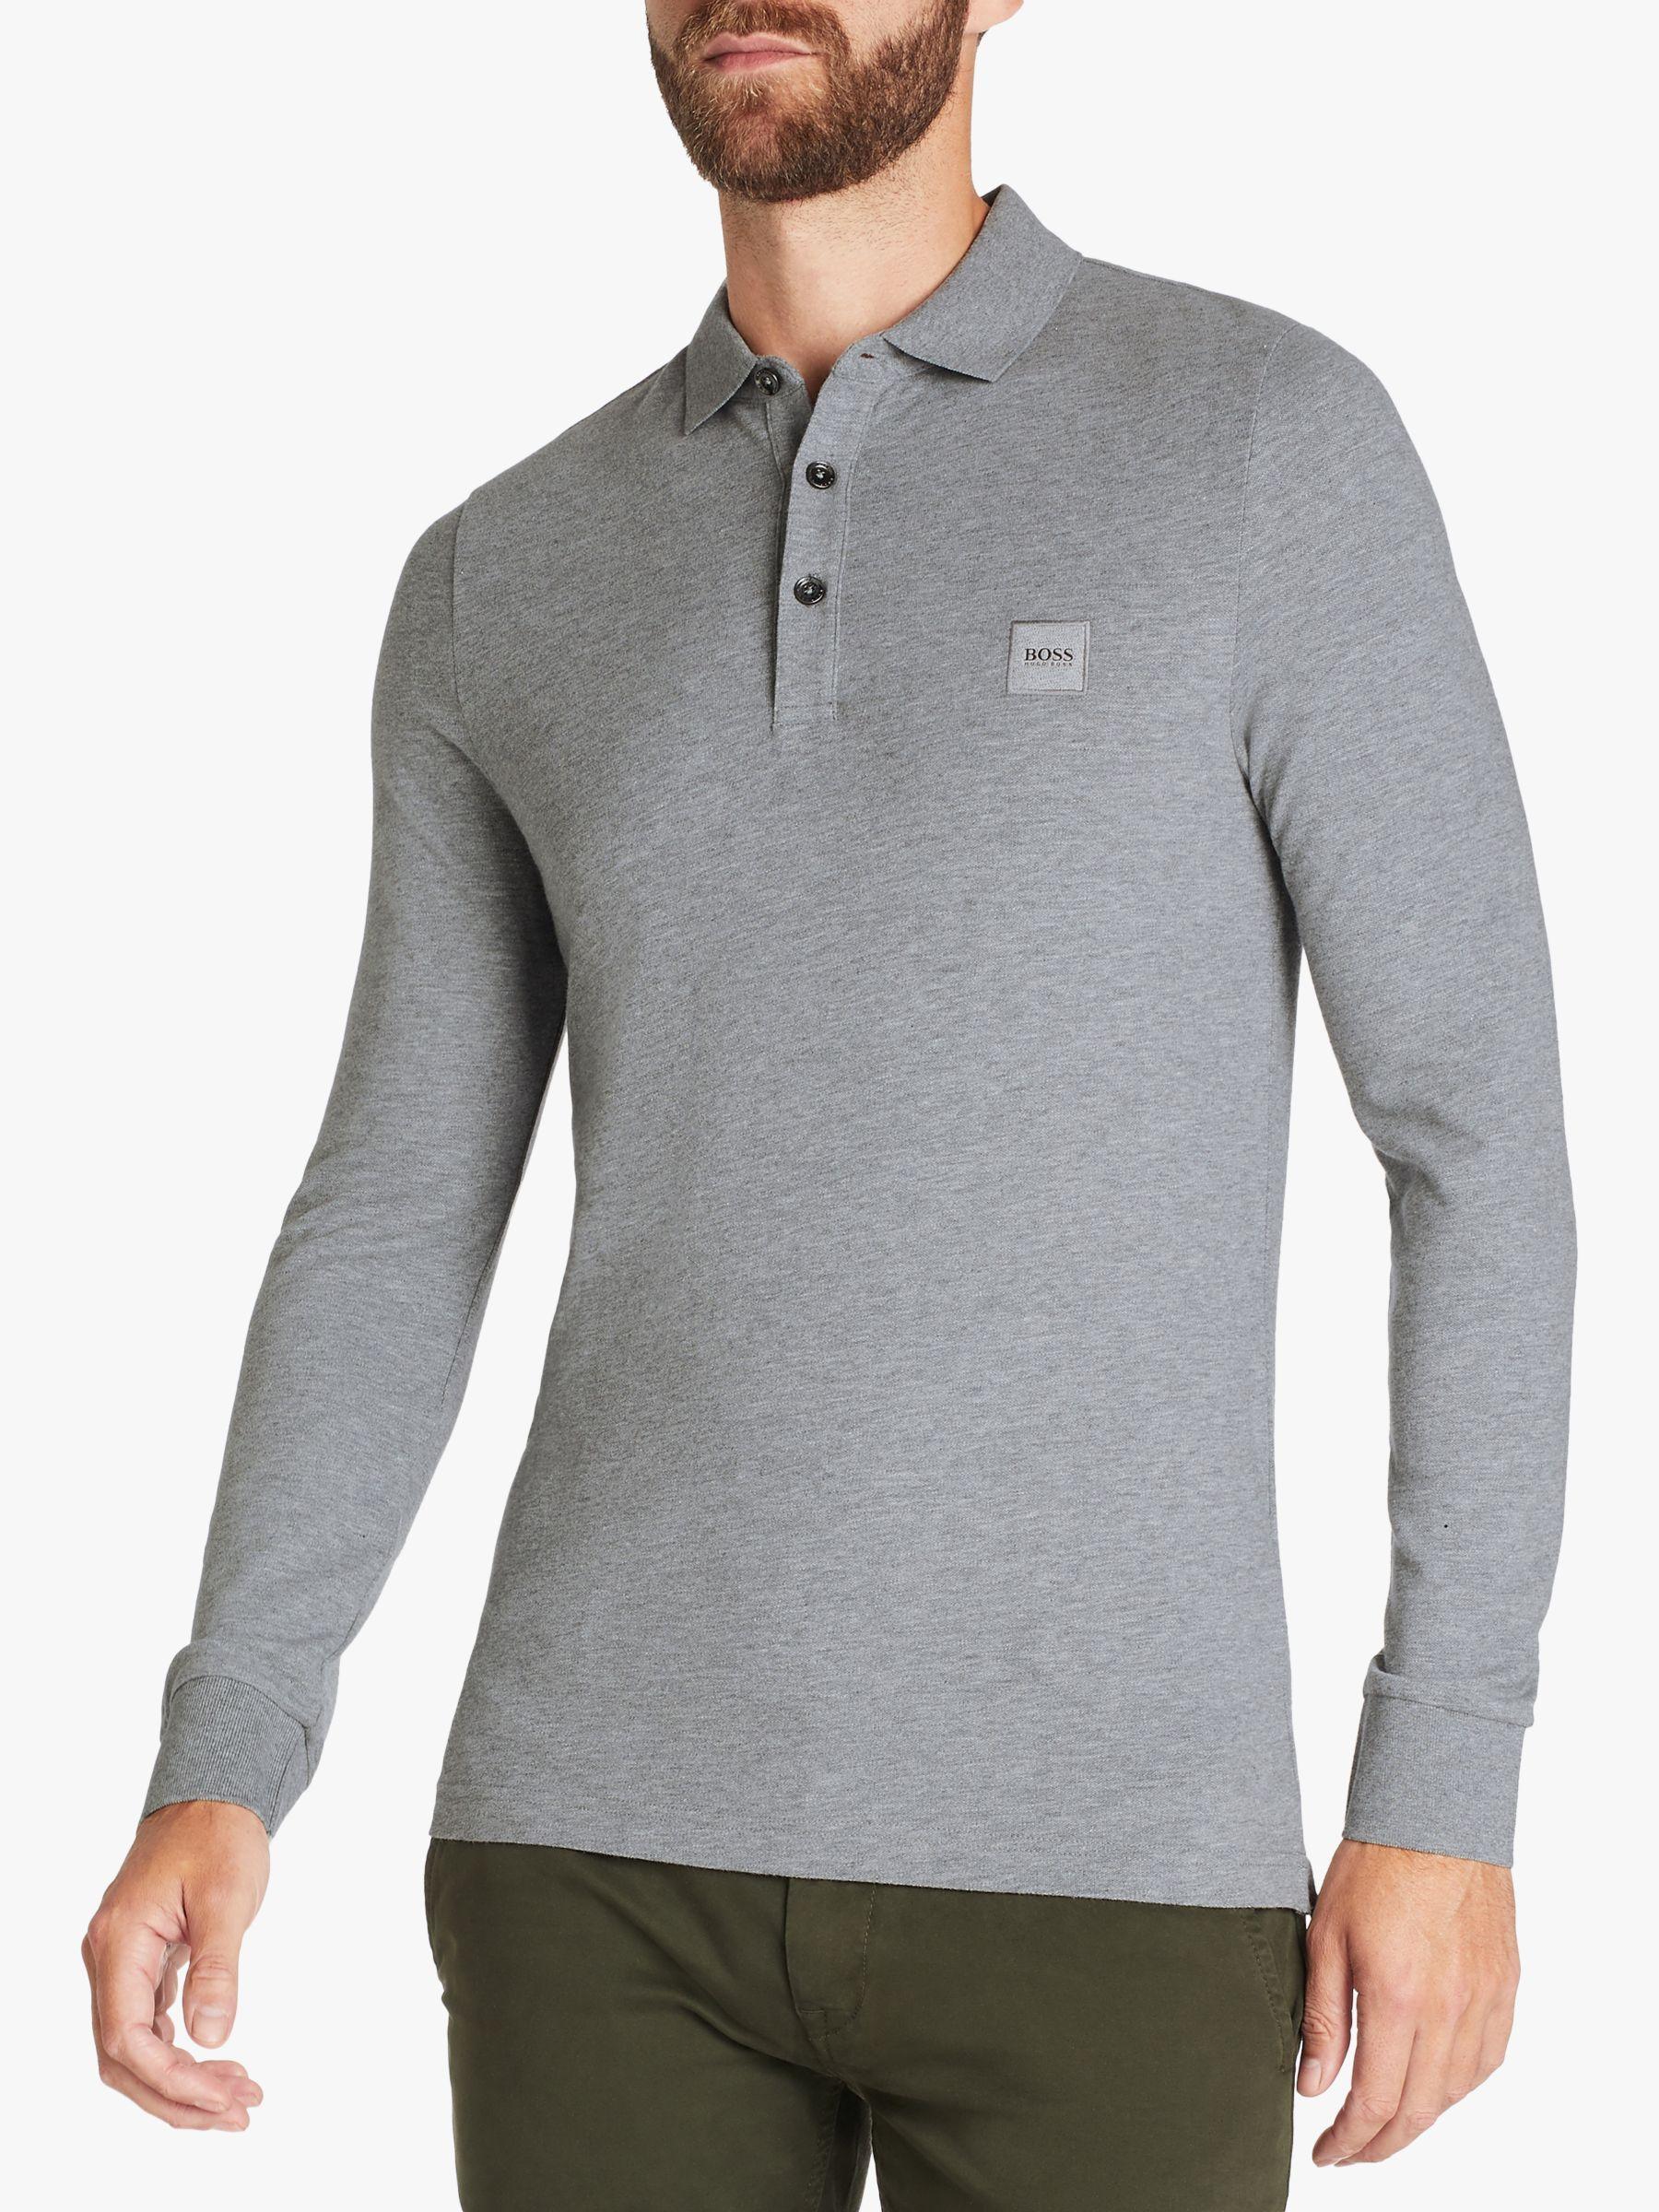 Hugo Boss Passerby Long Sleeve Cotton Black Polo Shirt